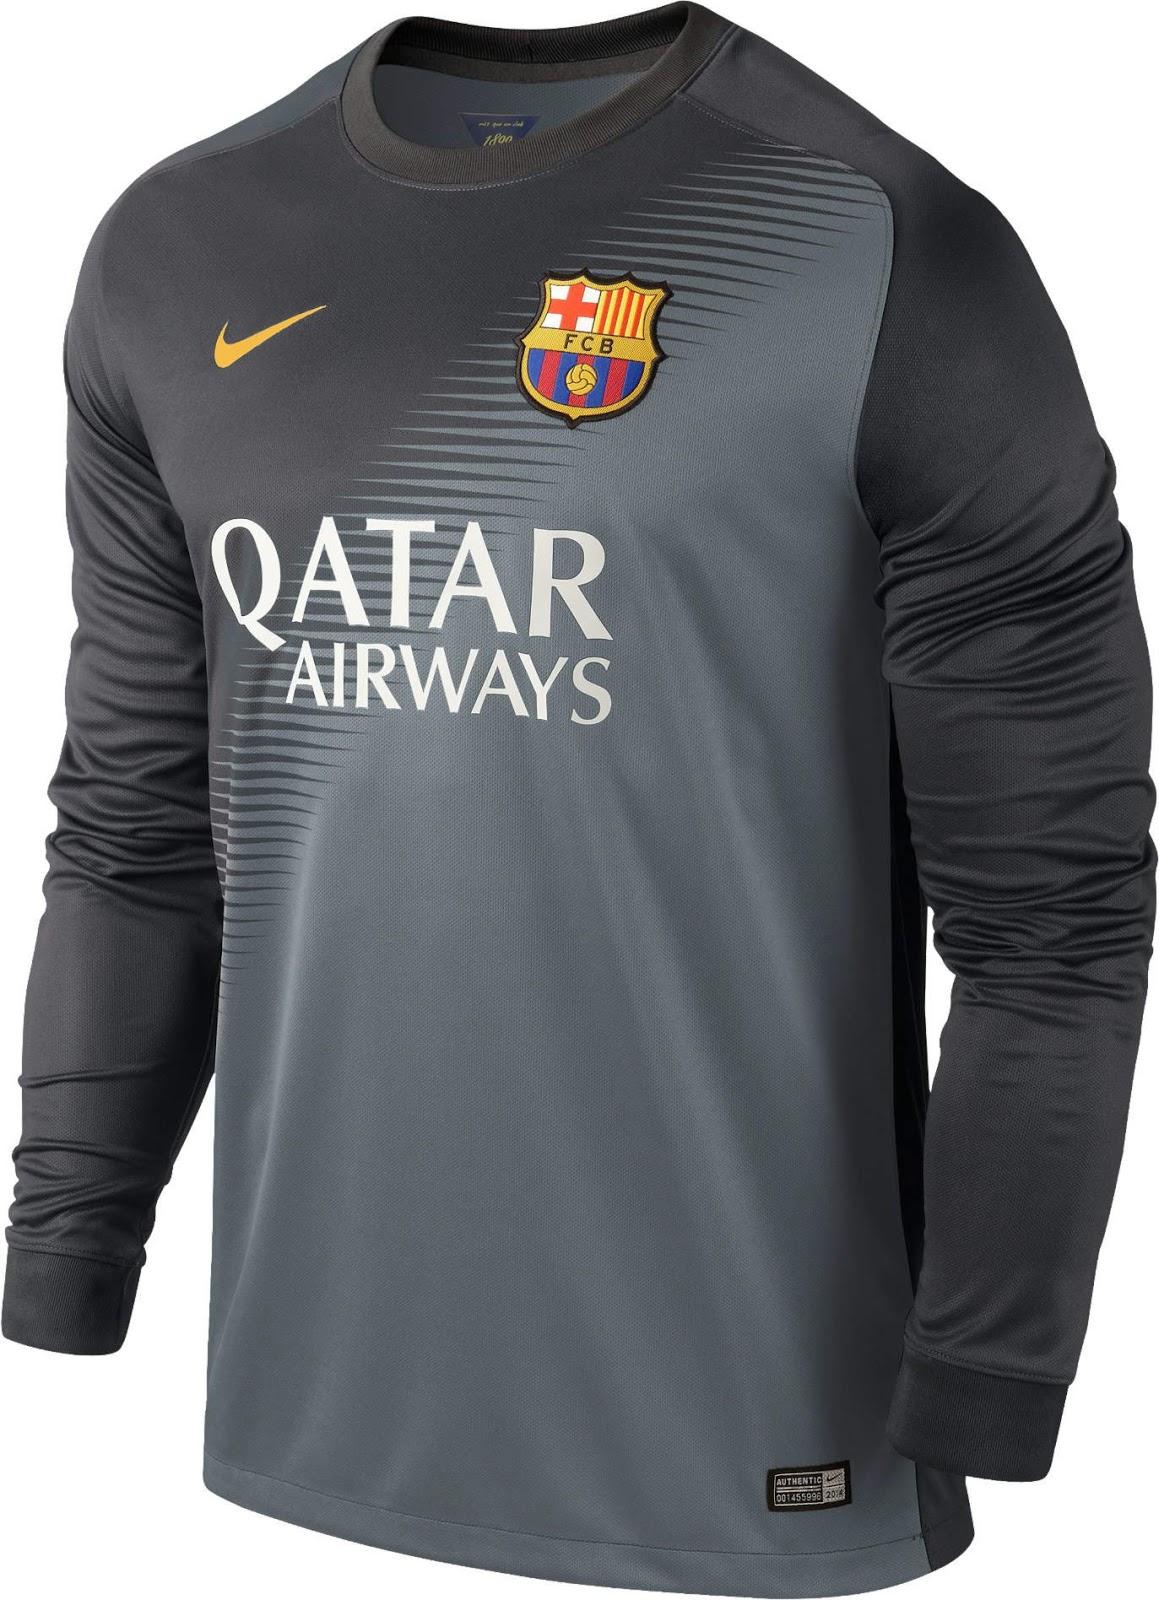 FlagWigs  FC Barcelona 2014-2015 Away Jersey Shirt Kits   Have a Fun ... 0422a62403fa9